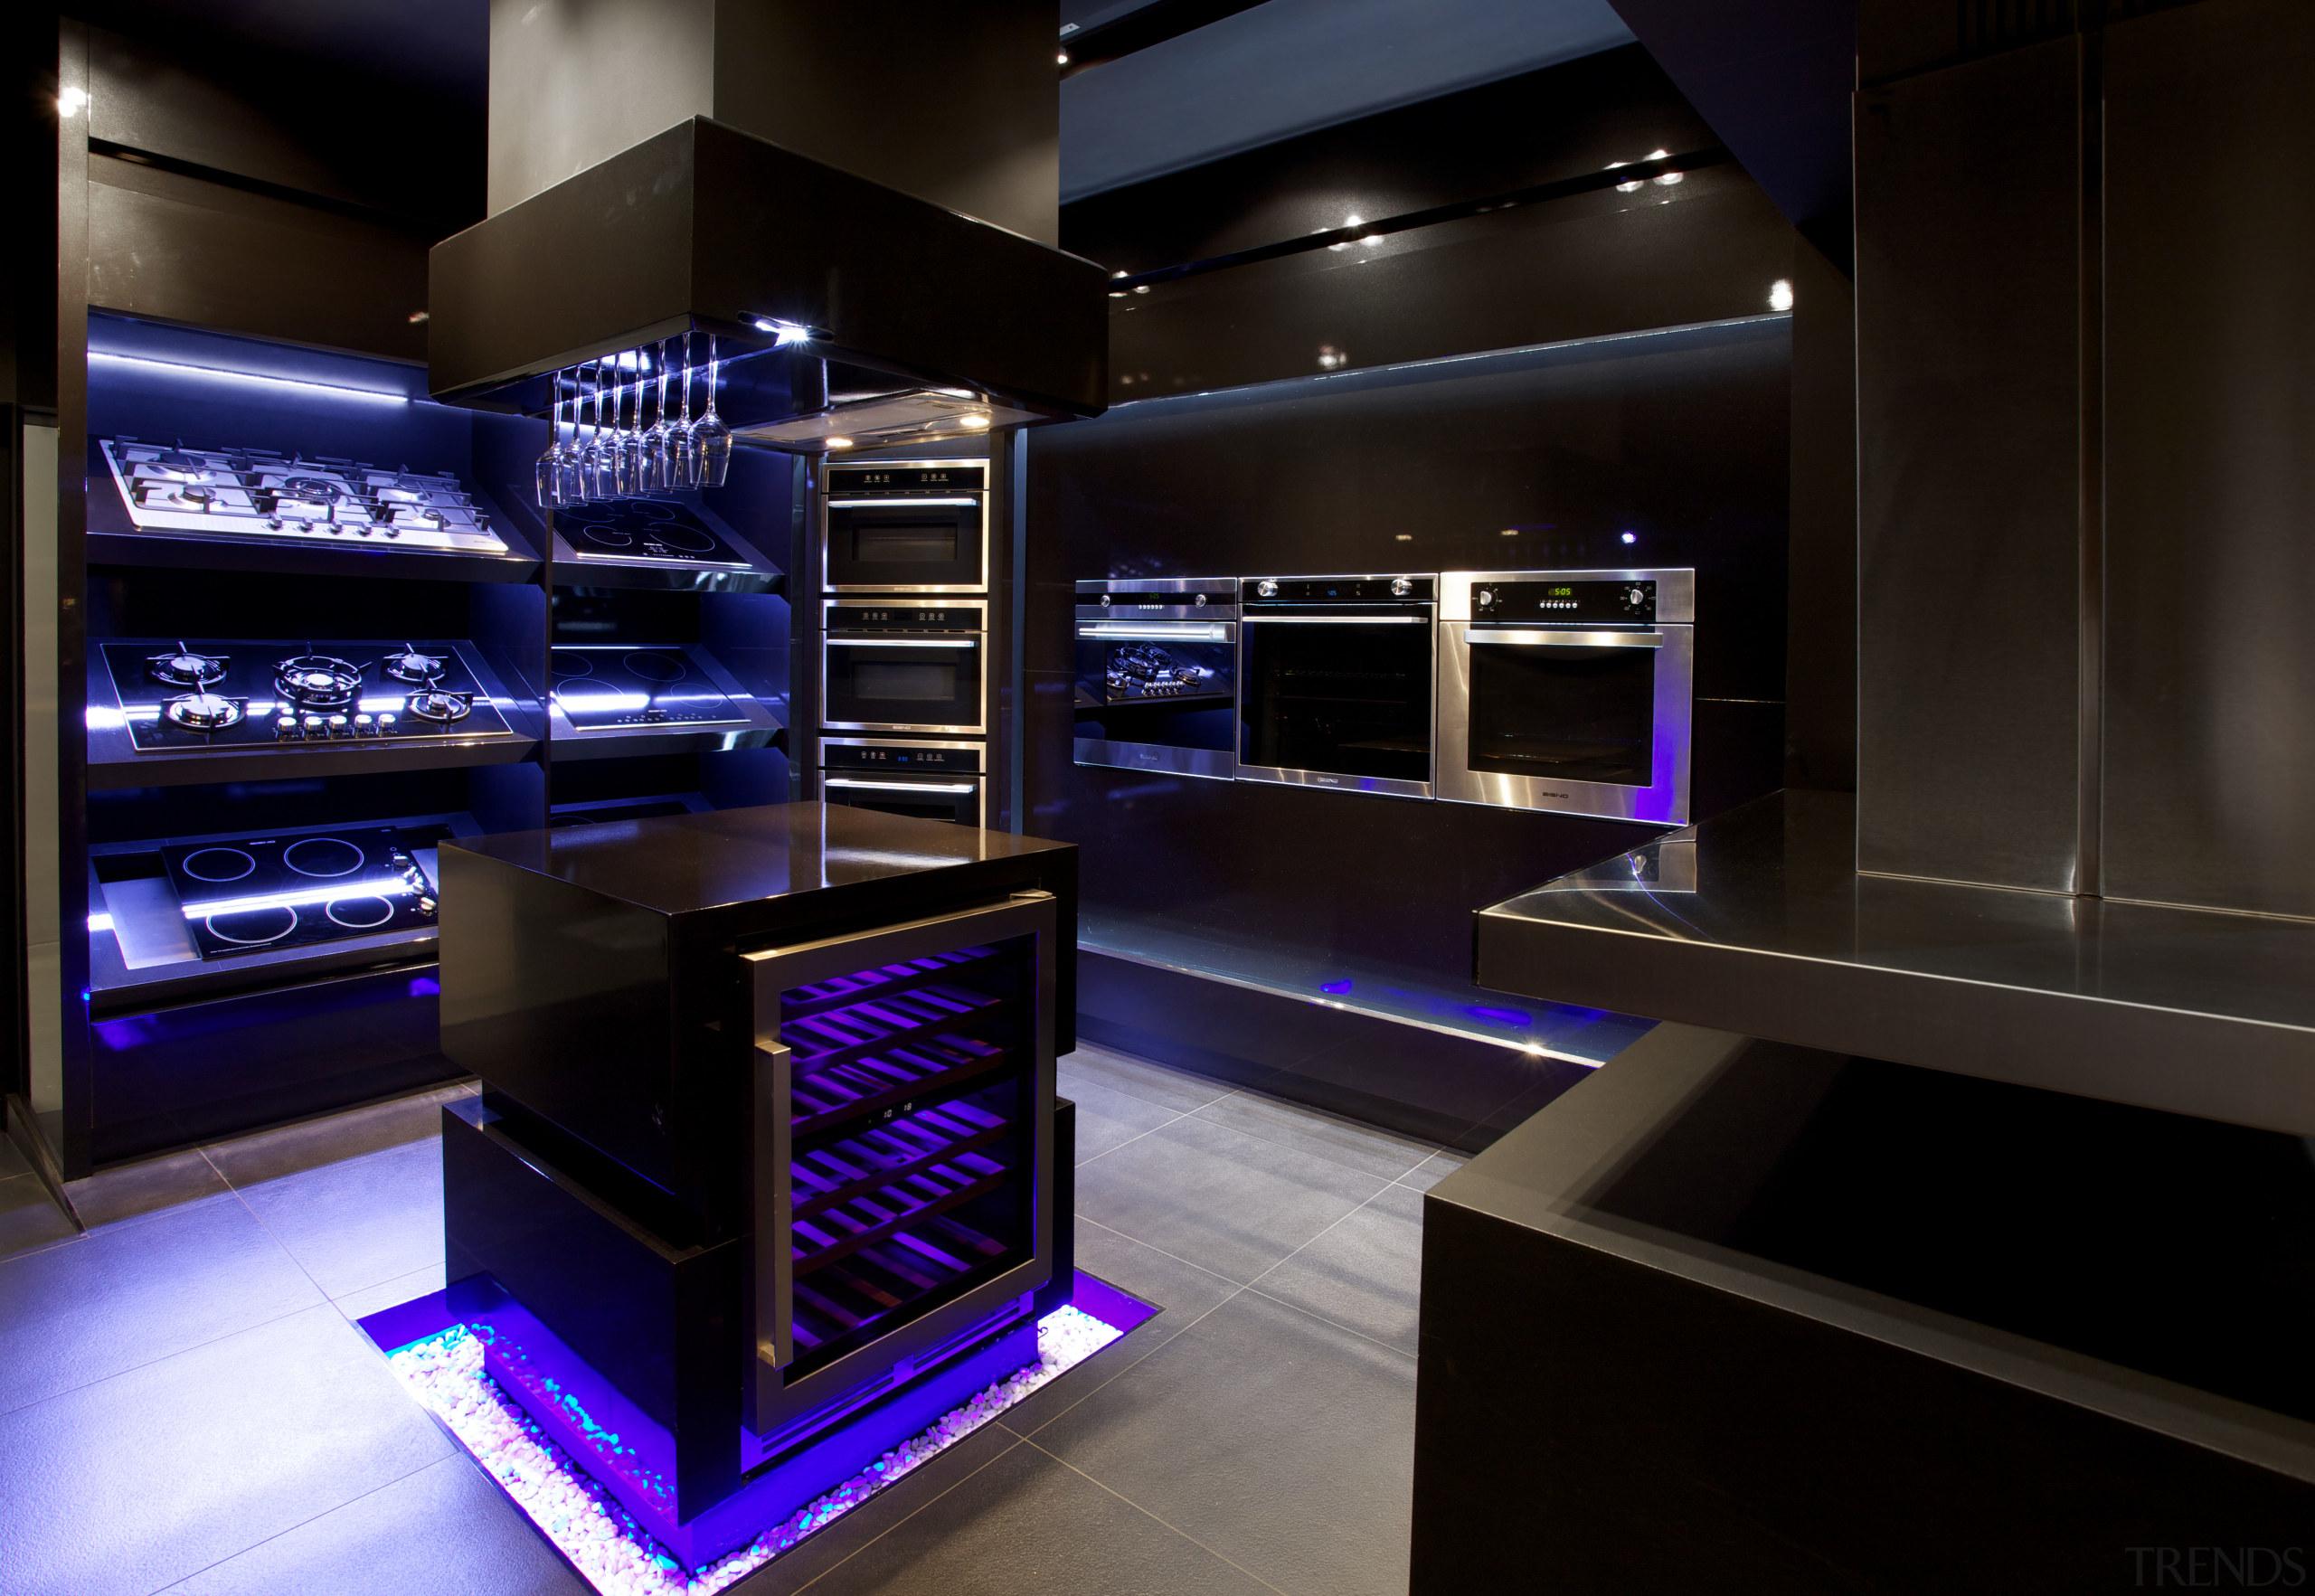 Italian appliances by Eisno Lifetech - Italian appliances interior design, black, blue